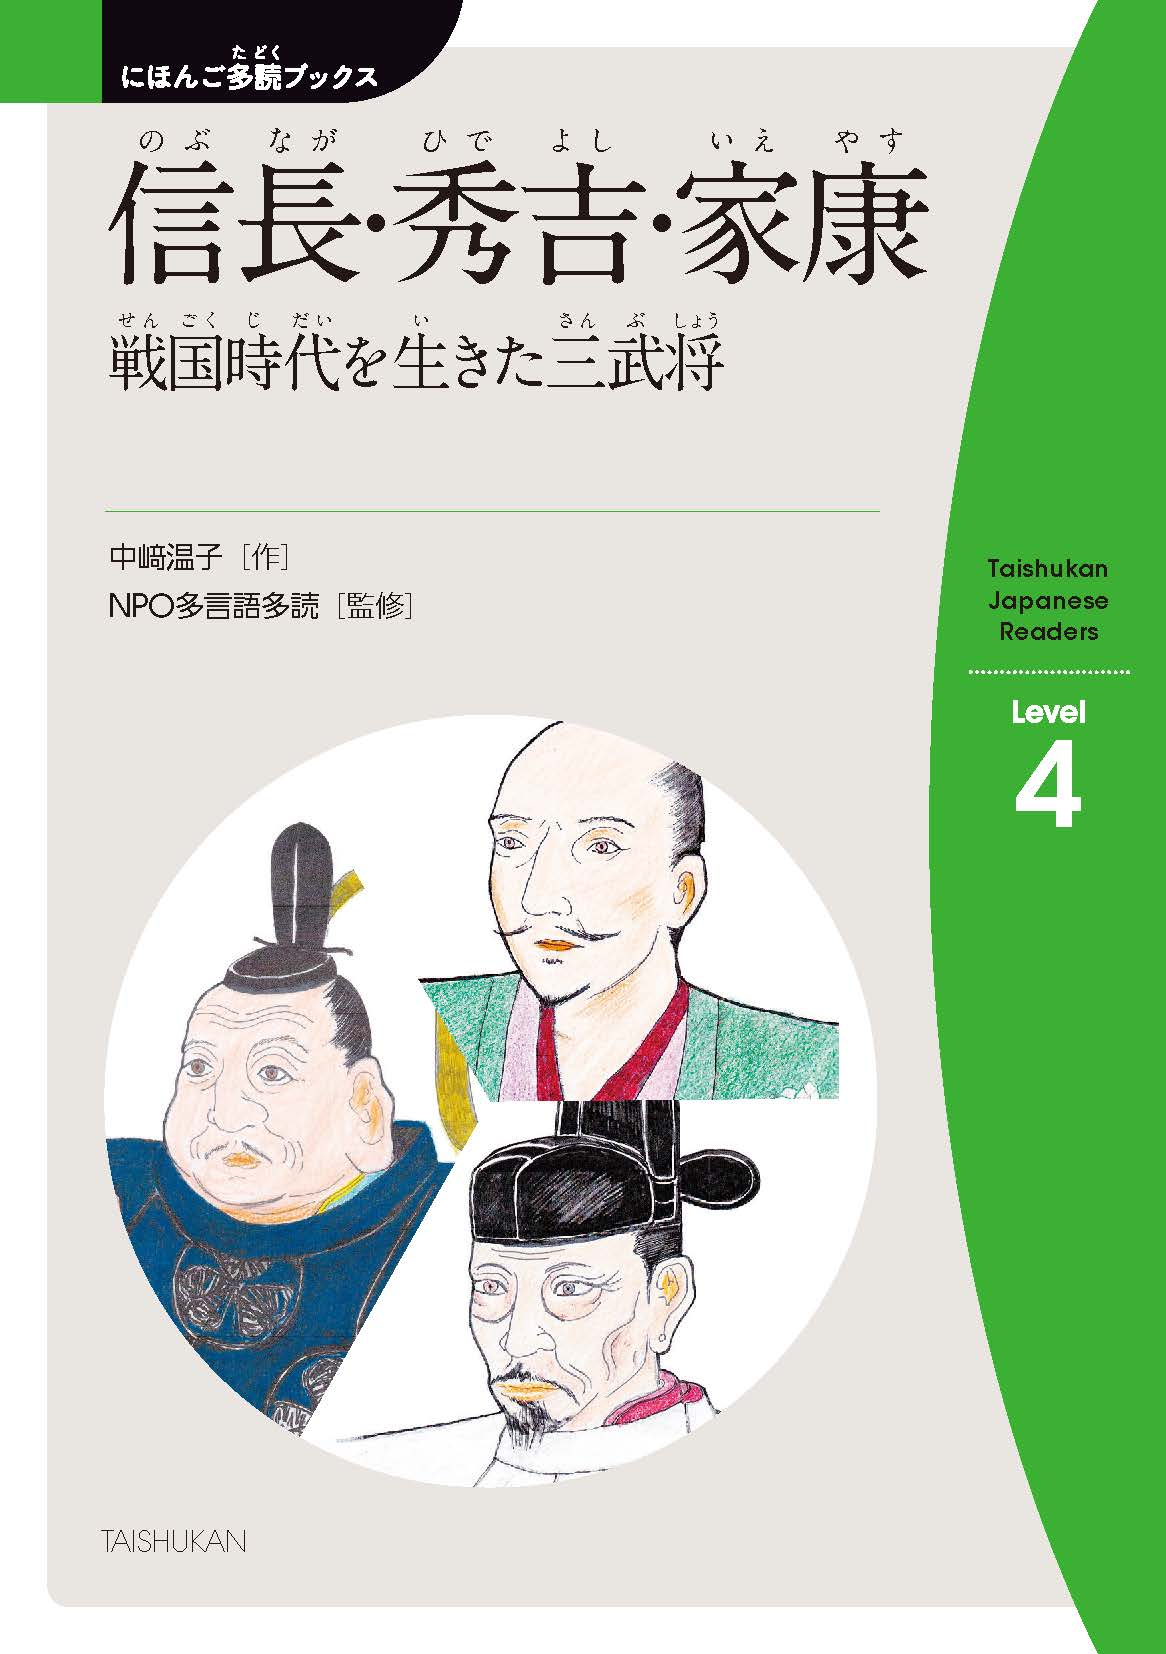 vol.5-3 信長(のぶなが)・秀吉(ひでよし)・家康(いえやす)~戦国(せんごく)時代(じだい)を生(い)きた三武将(さんぶしょう) Nobunaga, Hideyoshi and Ieyasu—Three Shoguns from the Civile War era